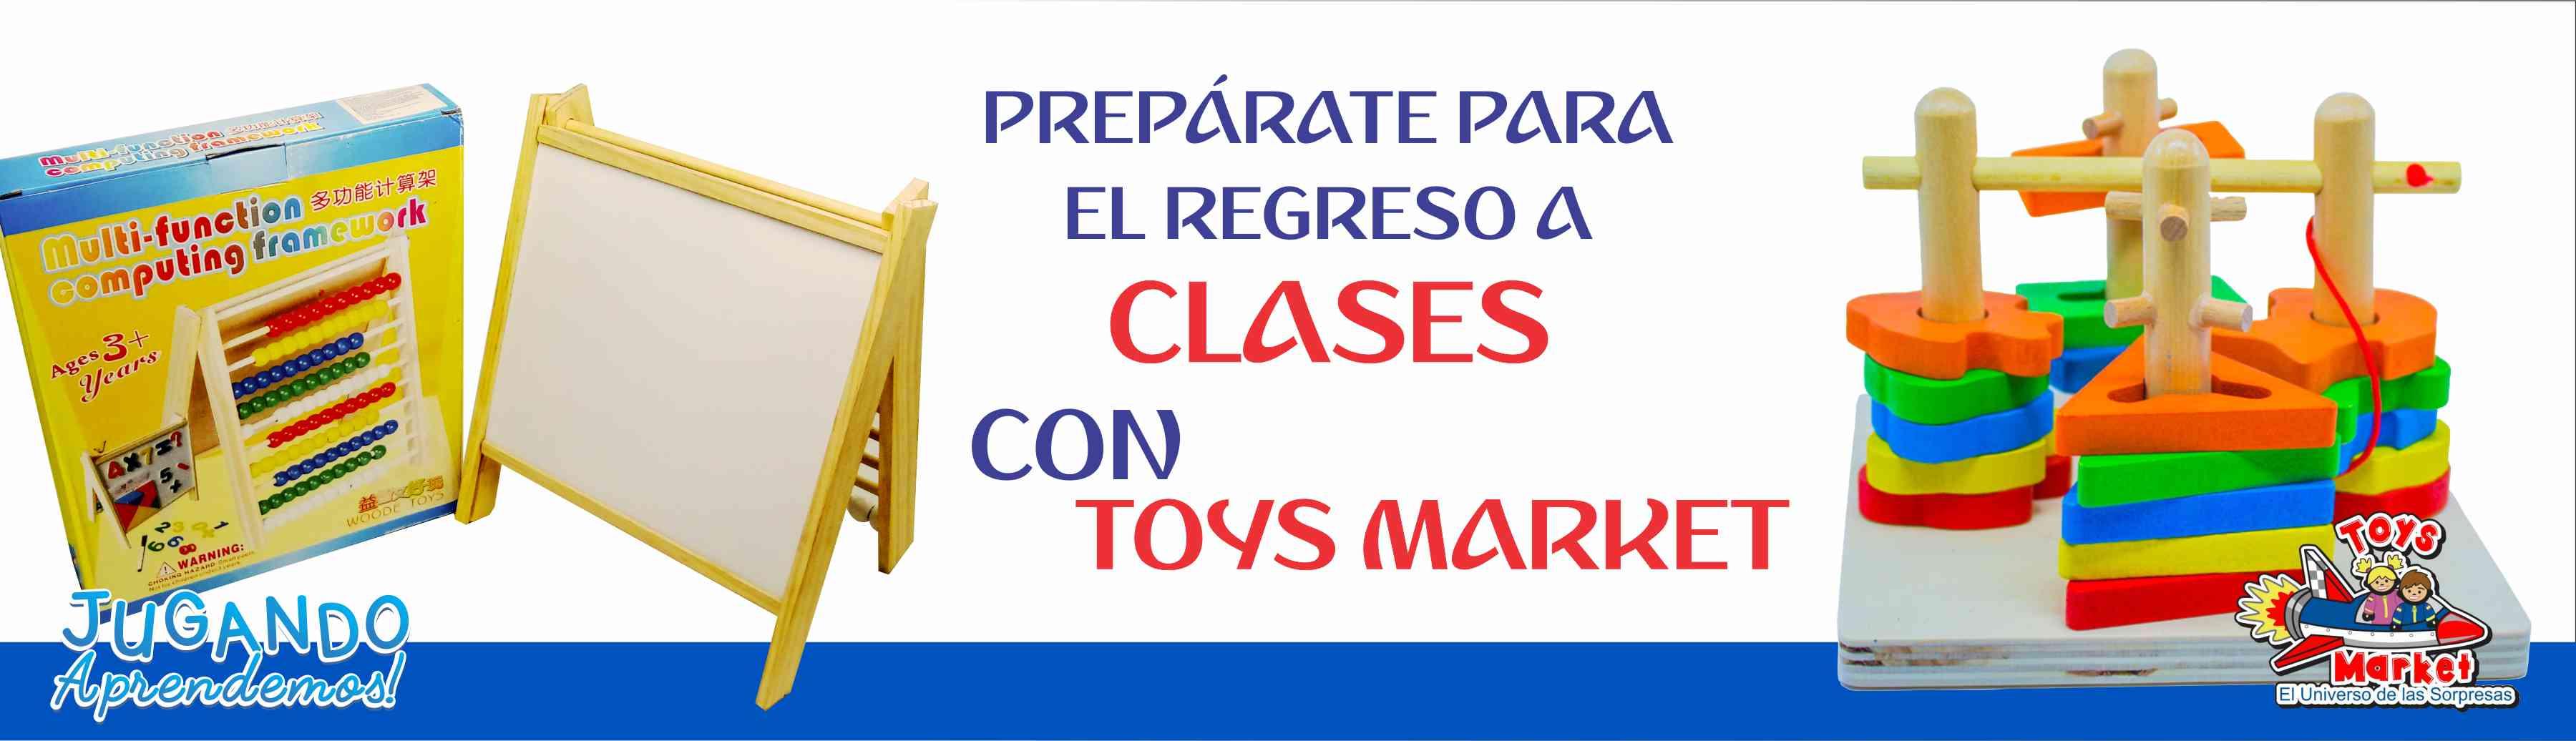 Banner Promocionales Site Toys Market 1805